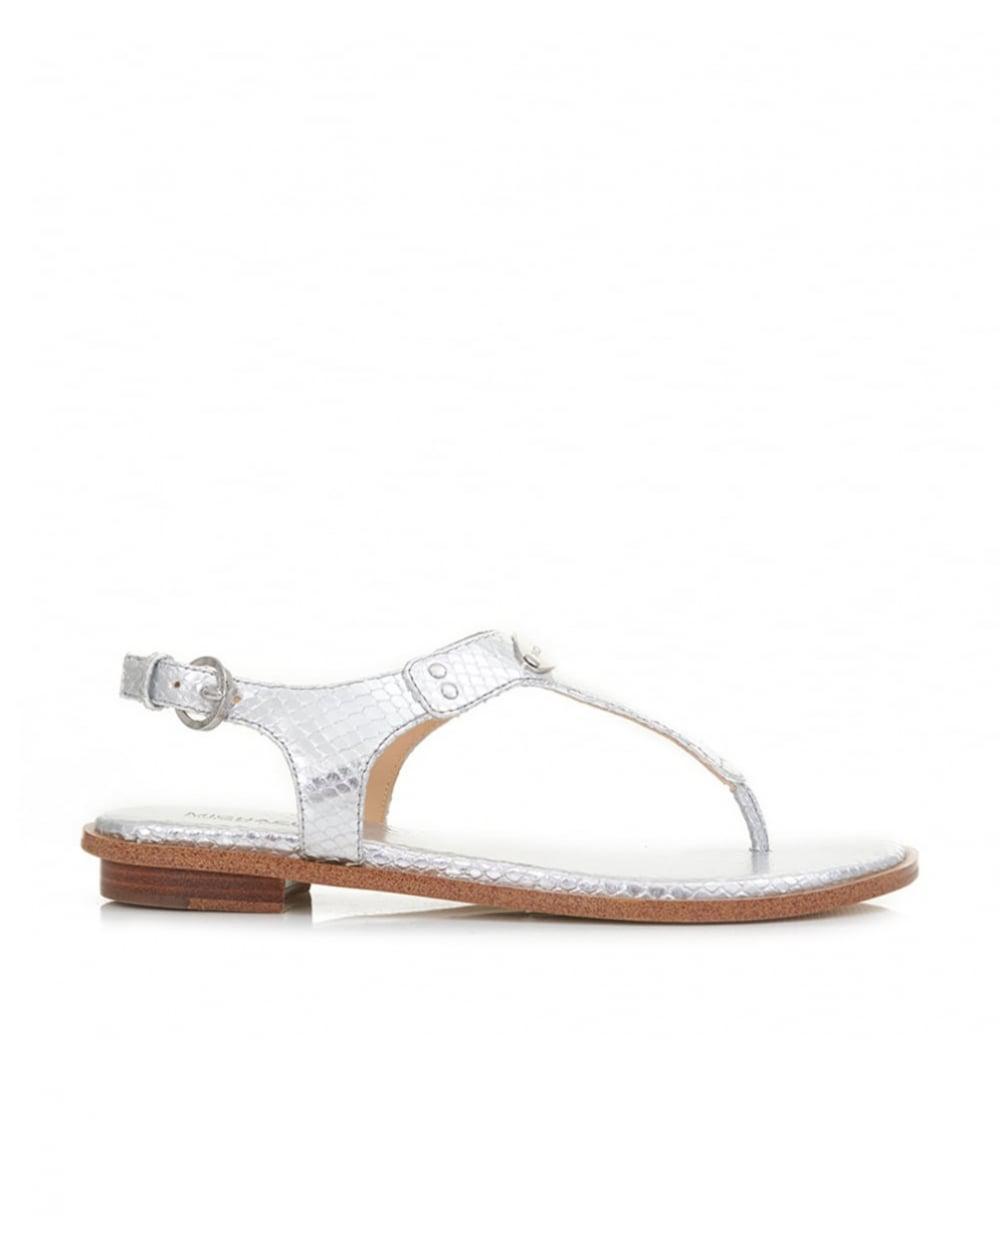 9c53a6b5686 Michael Kors Mk Plate Metallic Sandals in Metallic - Lyst